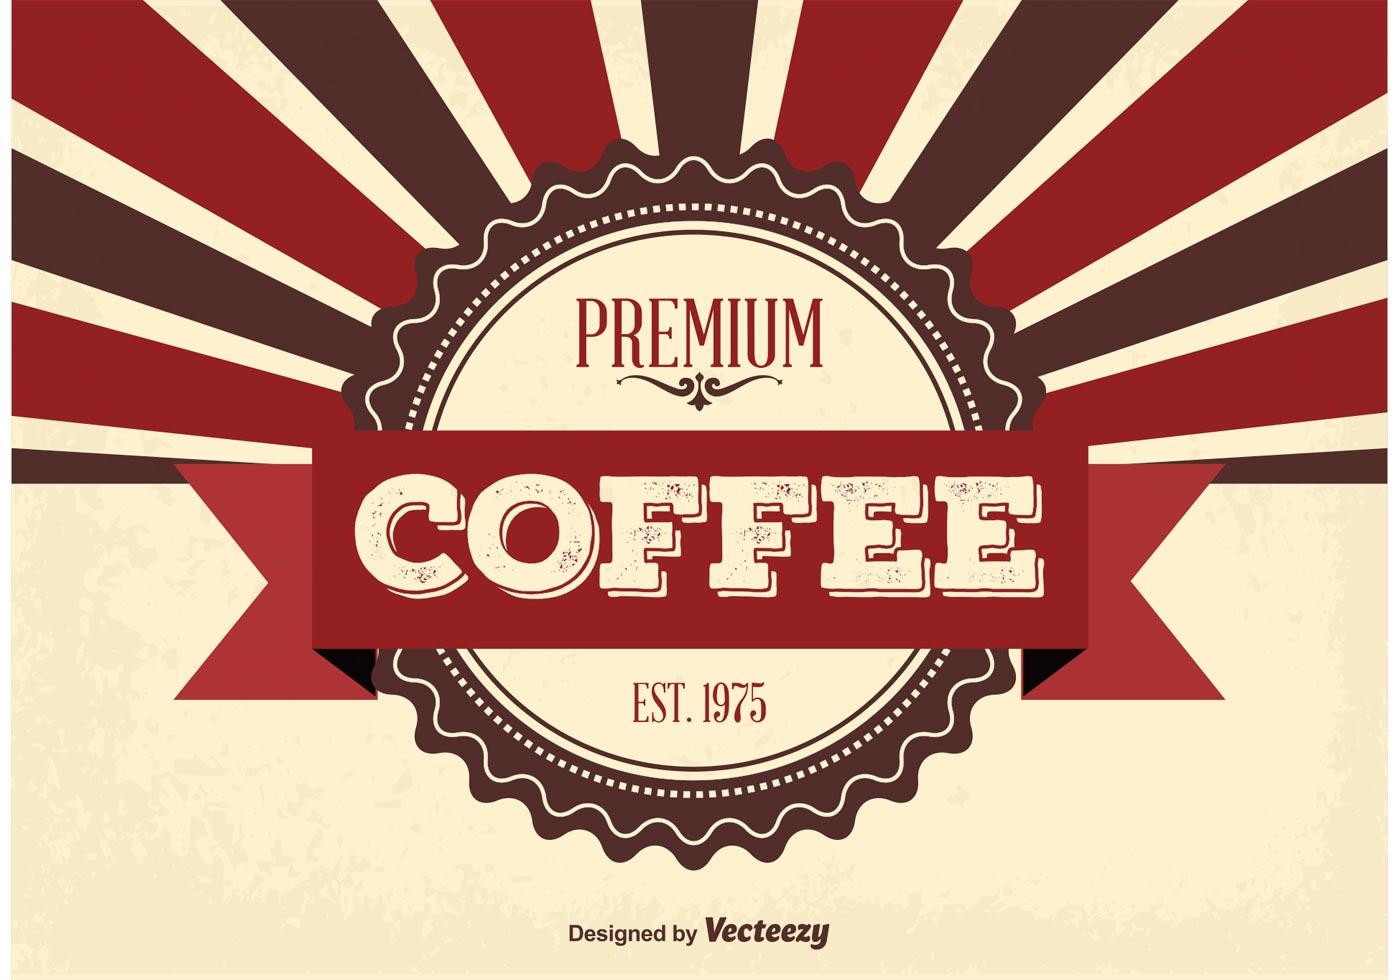 premium coffee background download free vector art